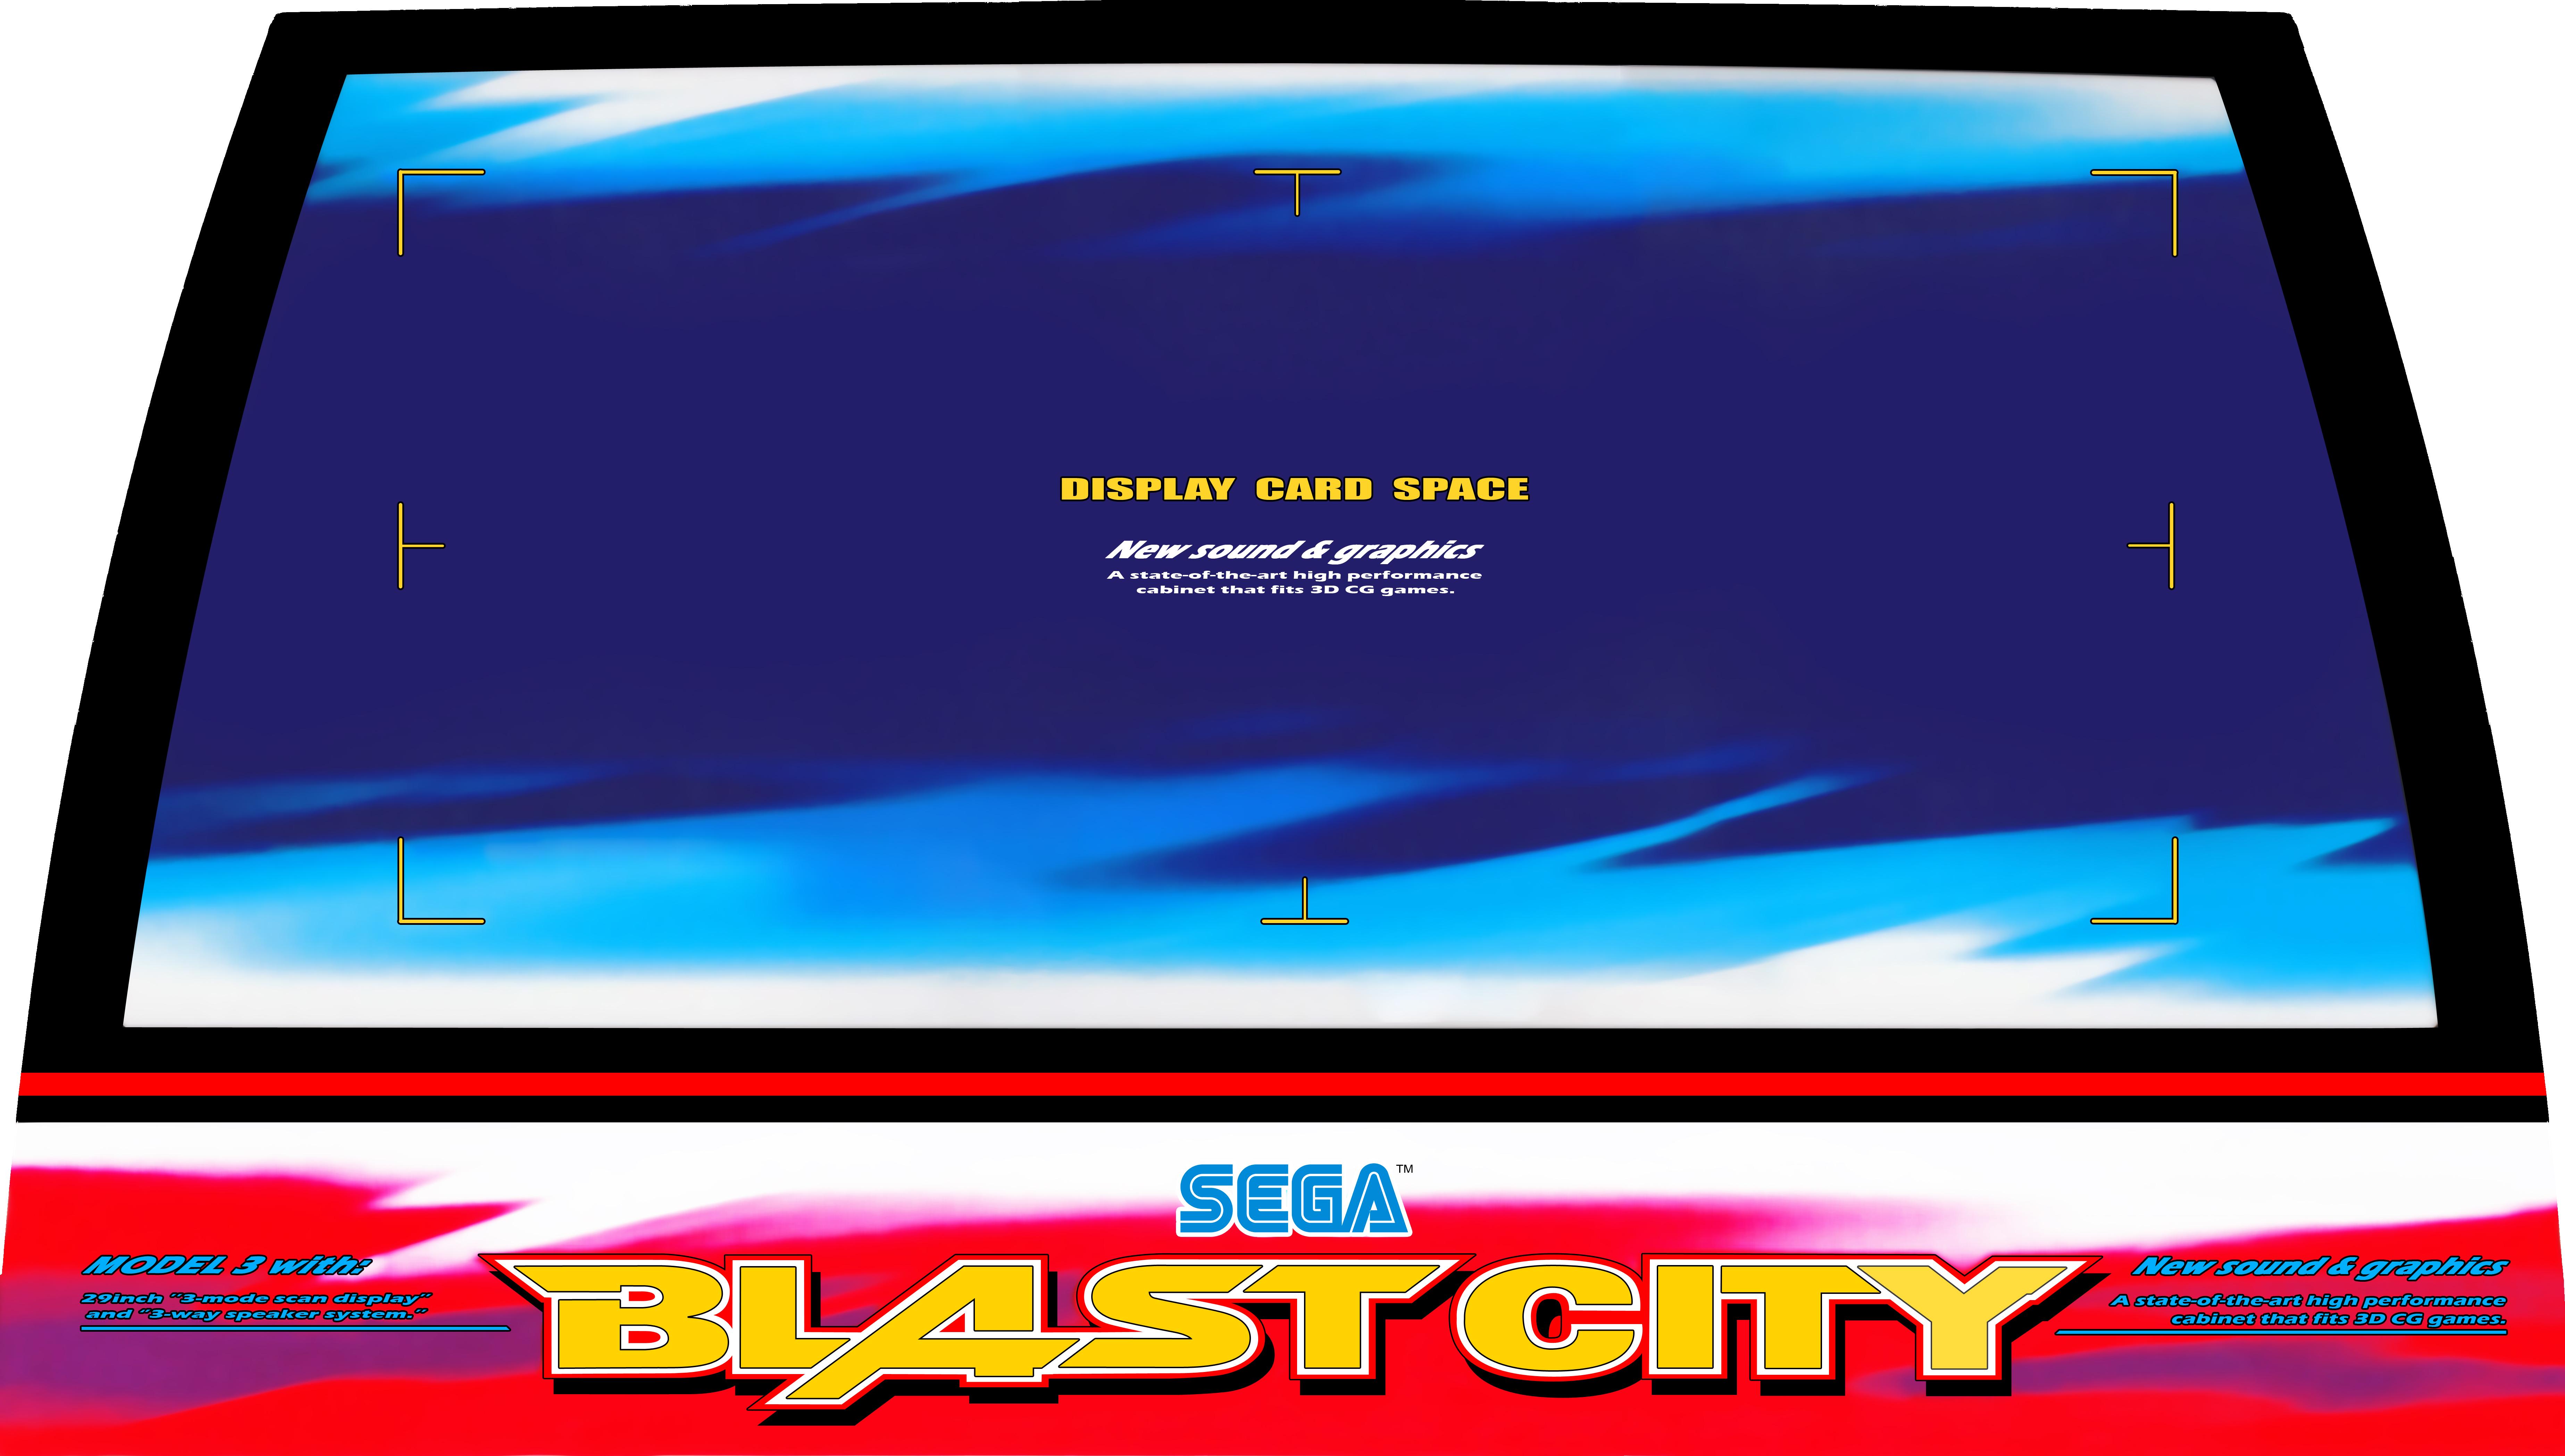 Sega Blast City